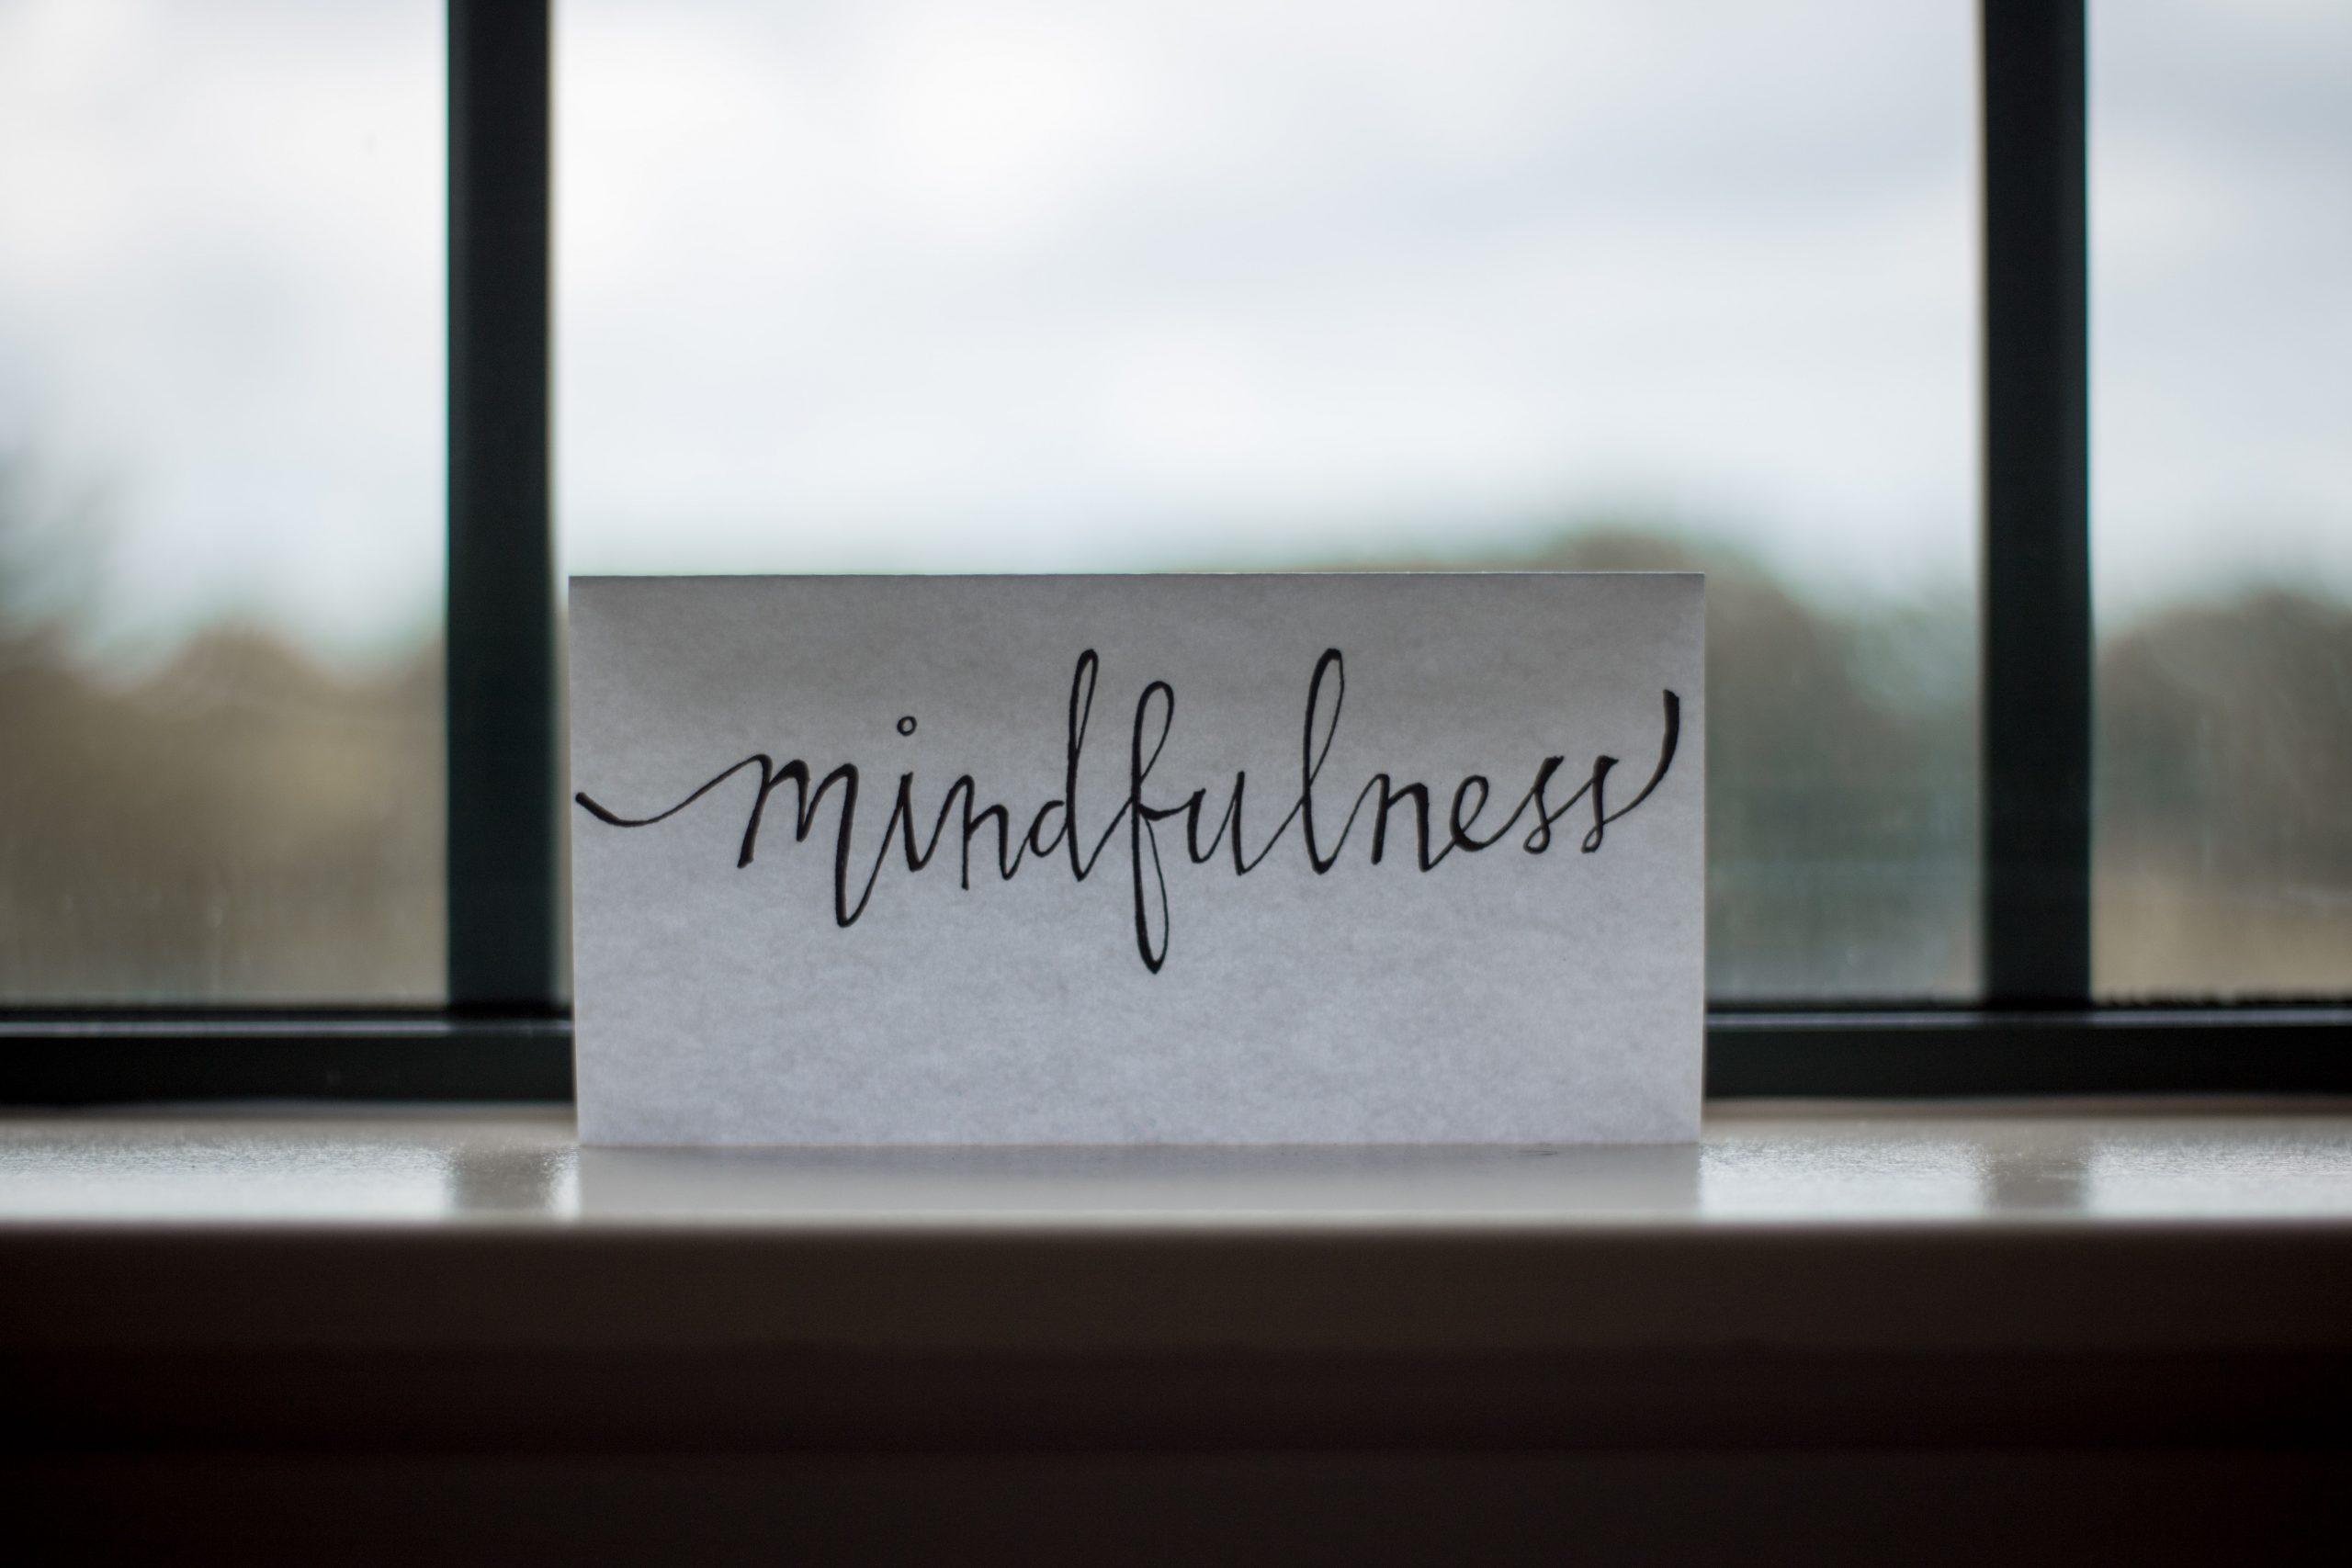 Yuk Praktek Aktivitas Mindfulness untuk Kesehatan Mental Kamu!